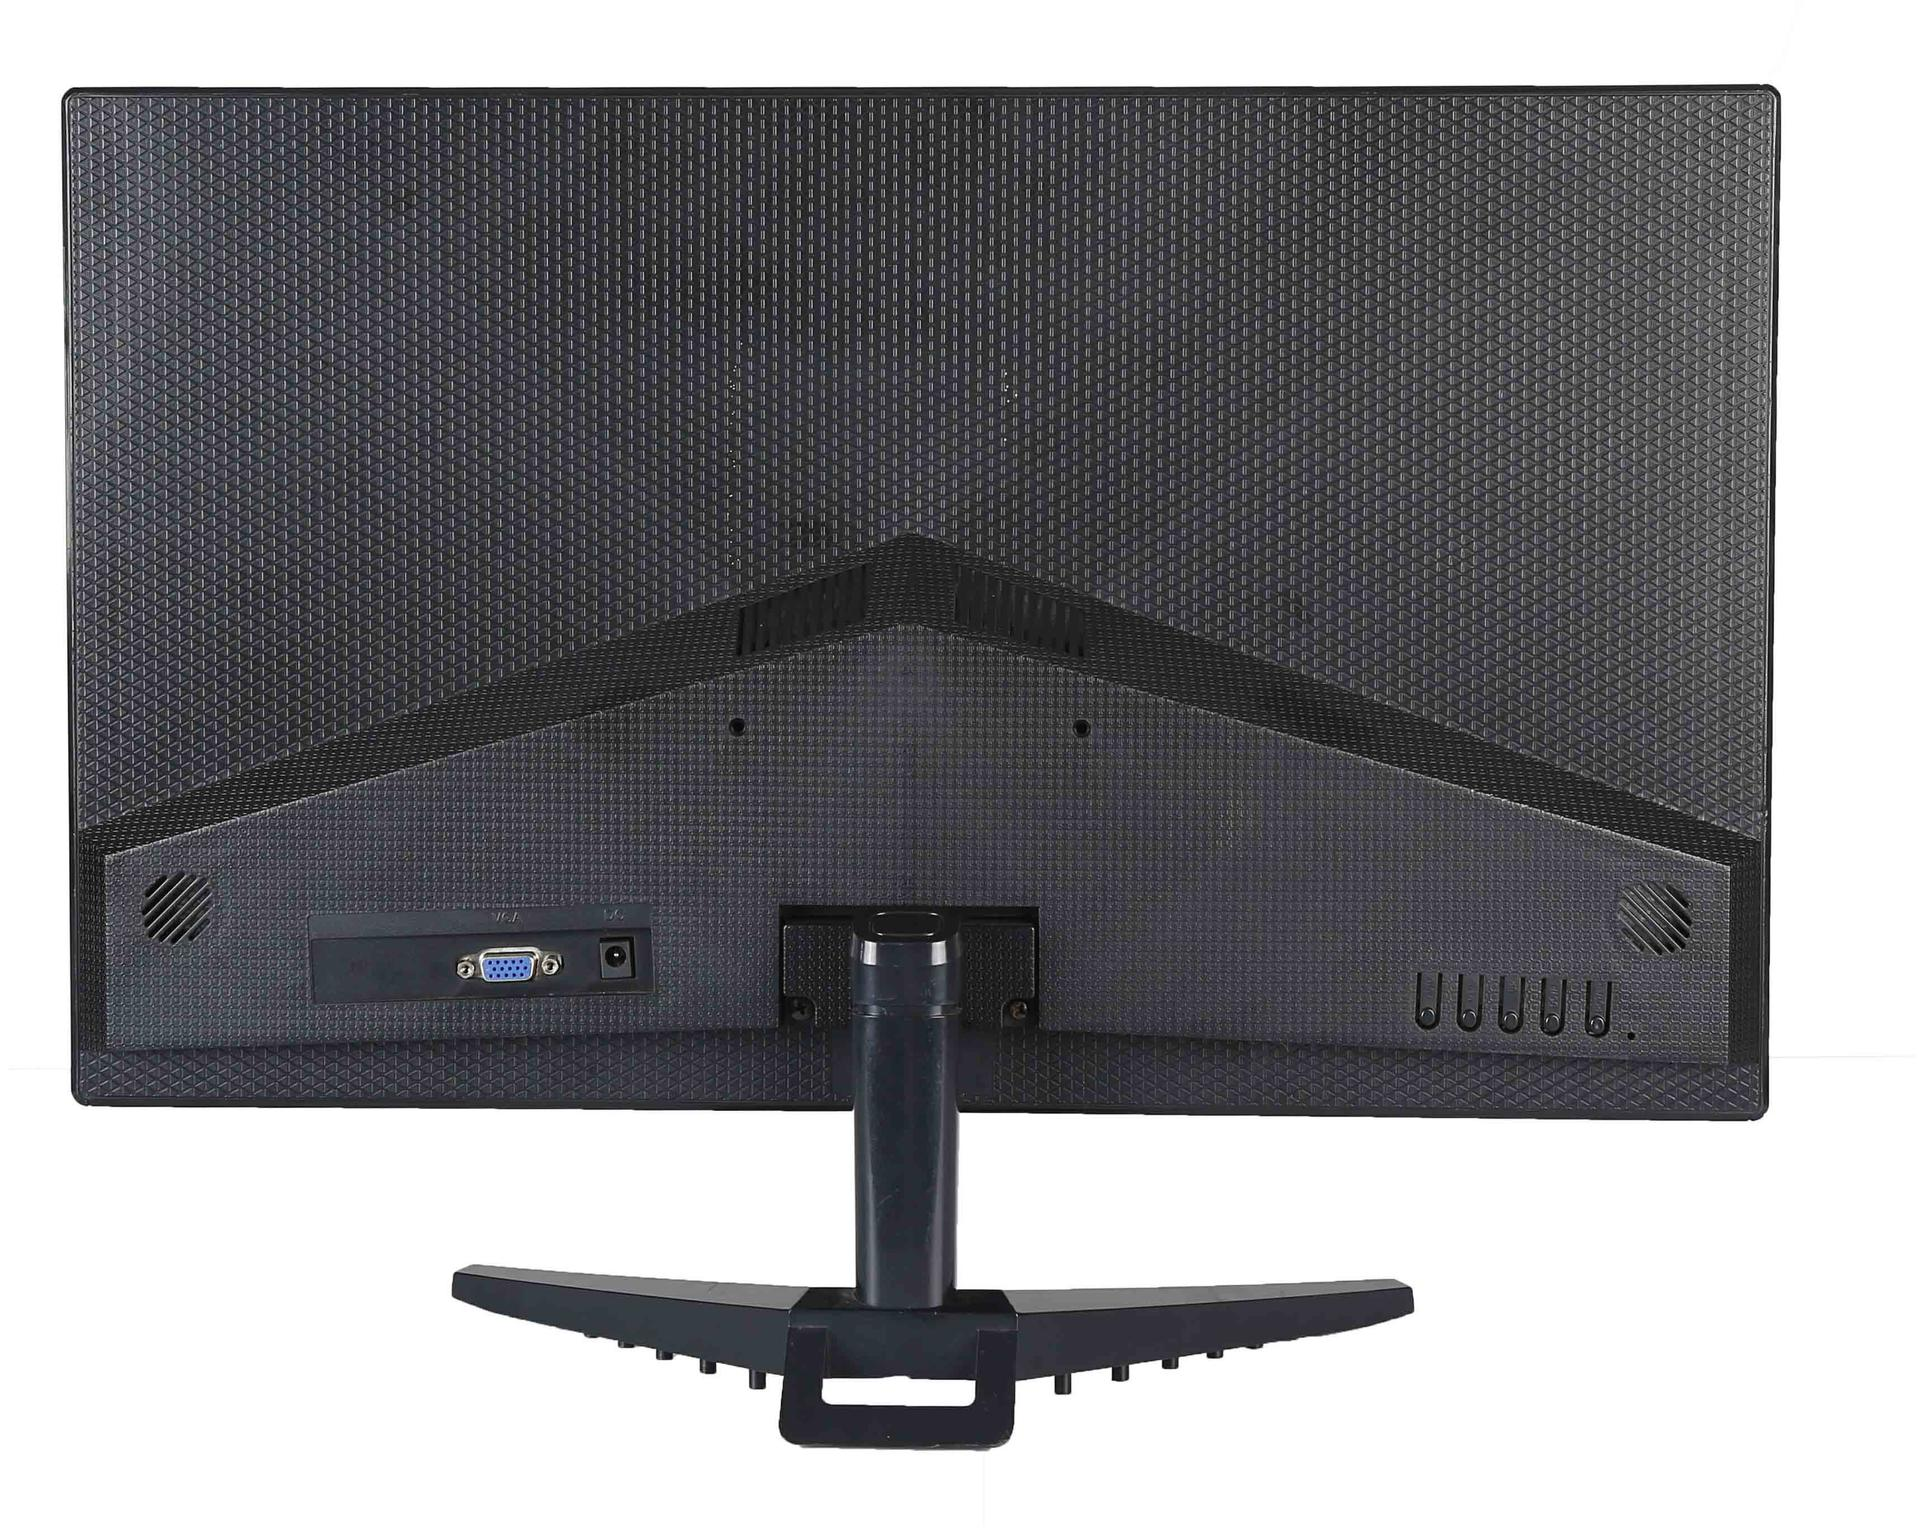 Oem Brand 8p Led Pc Monitor 8.8/8 Inch Widescreen Hdmi/vga